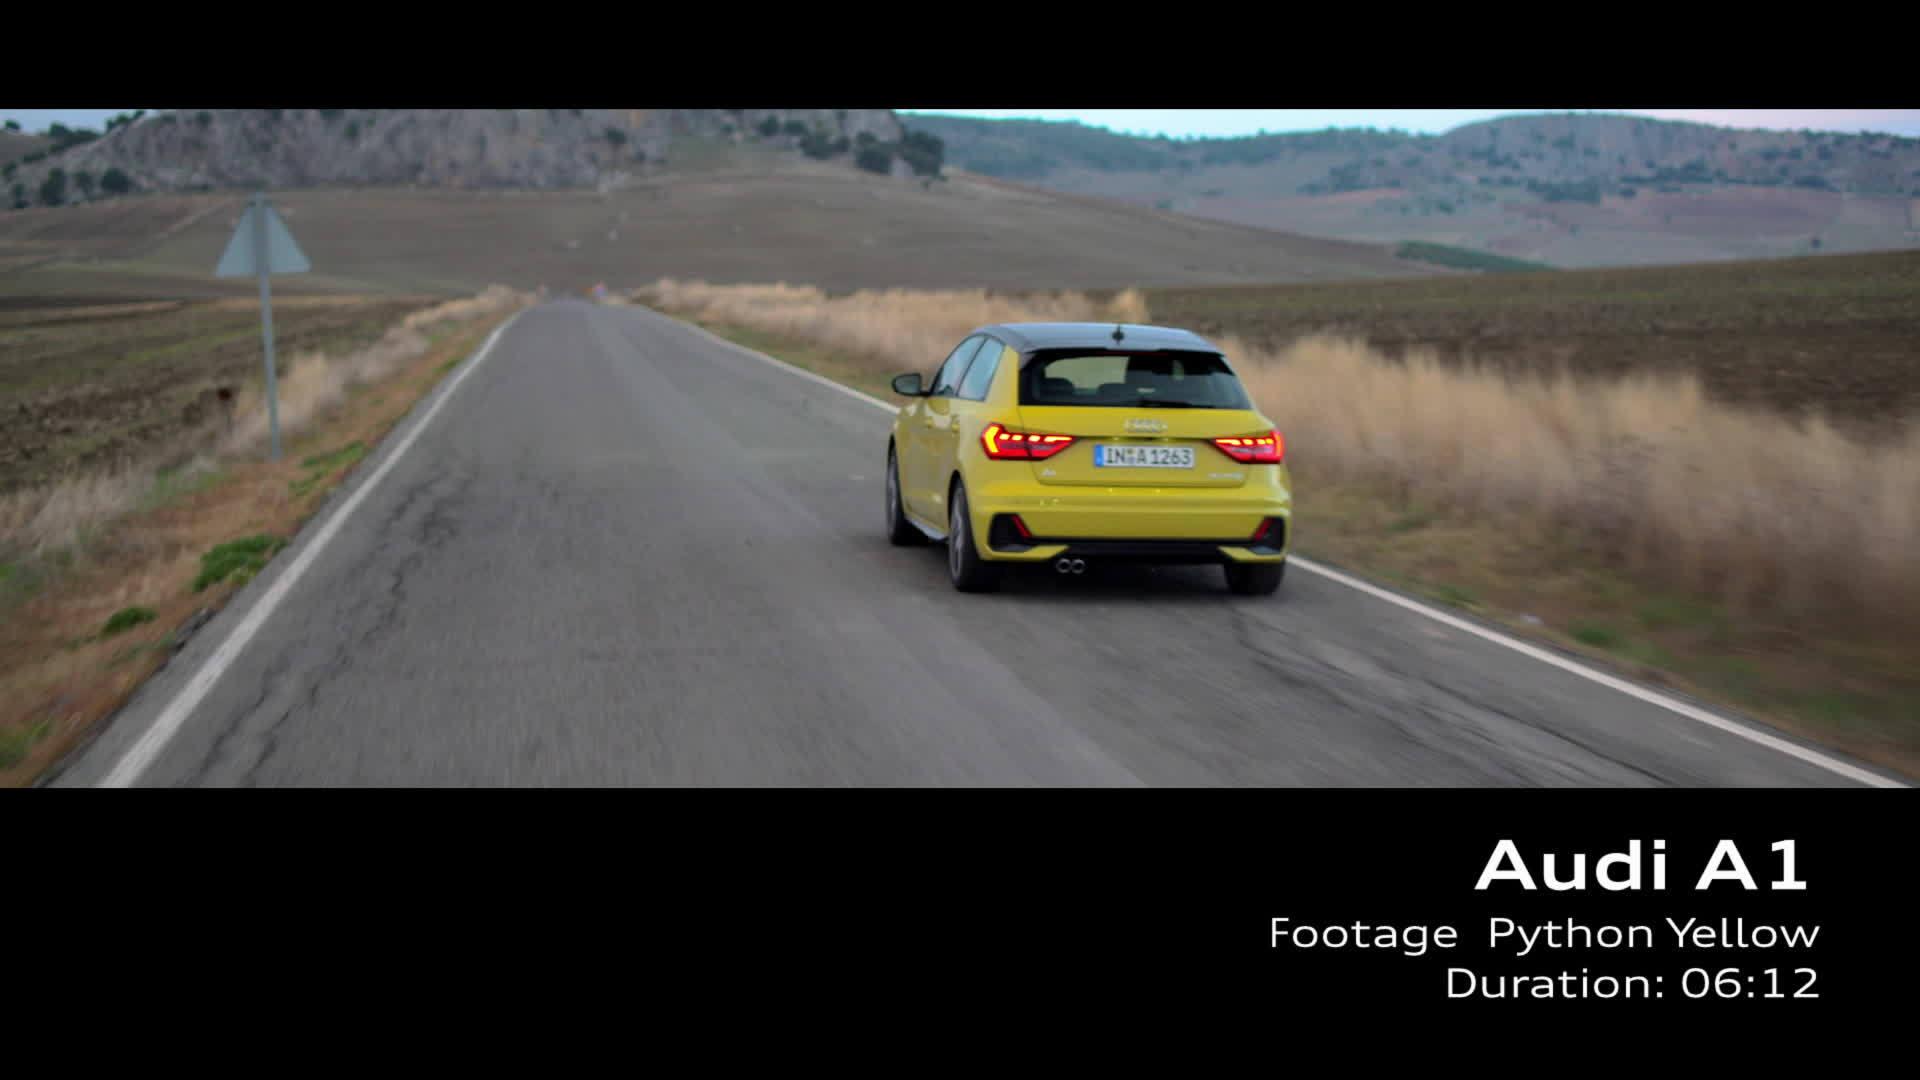 Audi A1 Footage Pythongelb (2018)